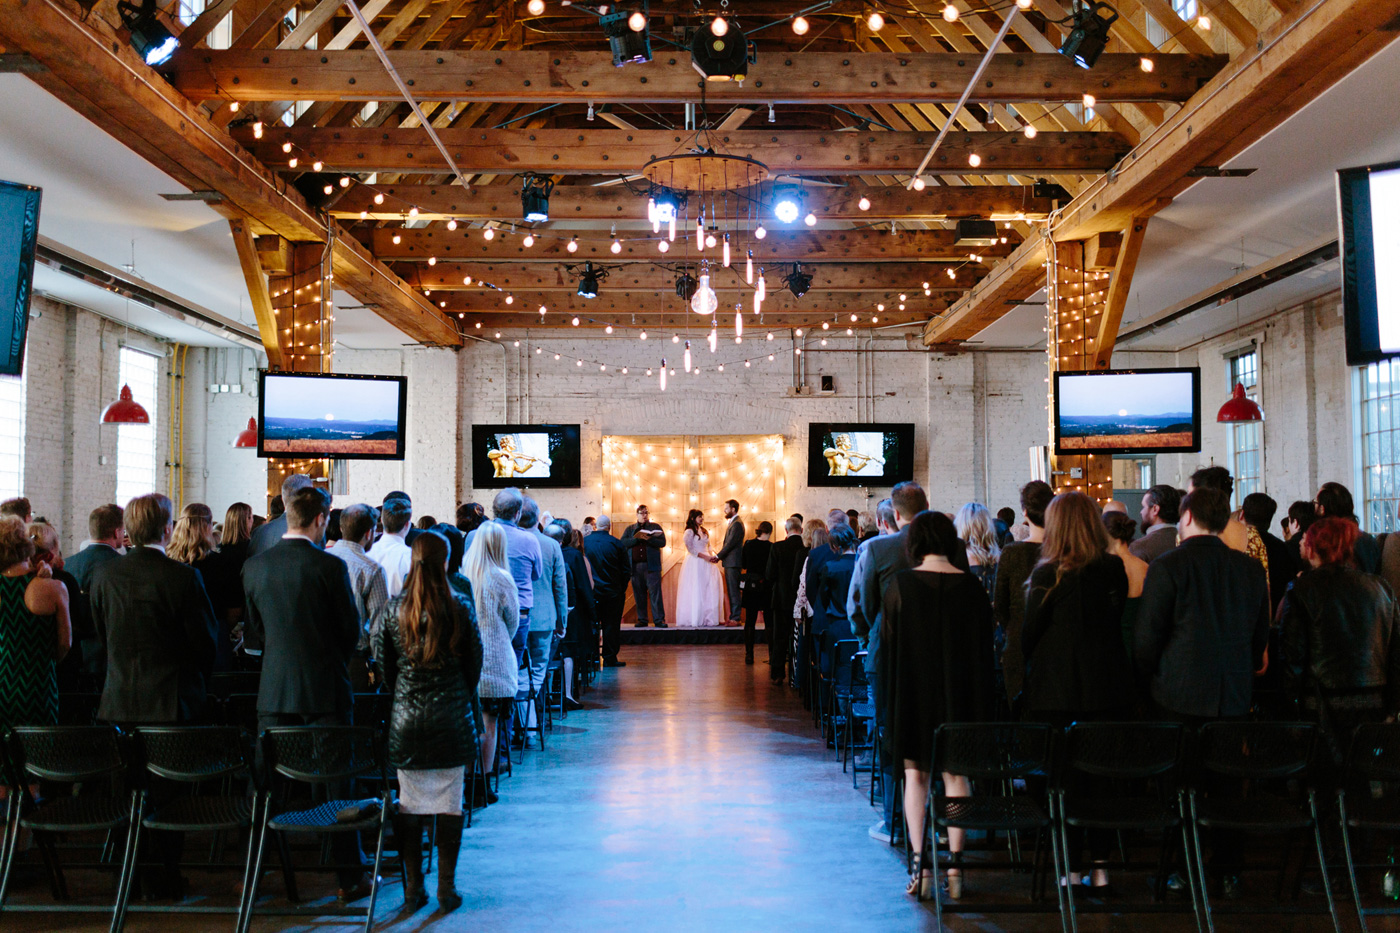 Studios-at-Overland-Crossing-Wedding-Photographer-00034.jpg